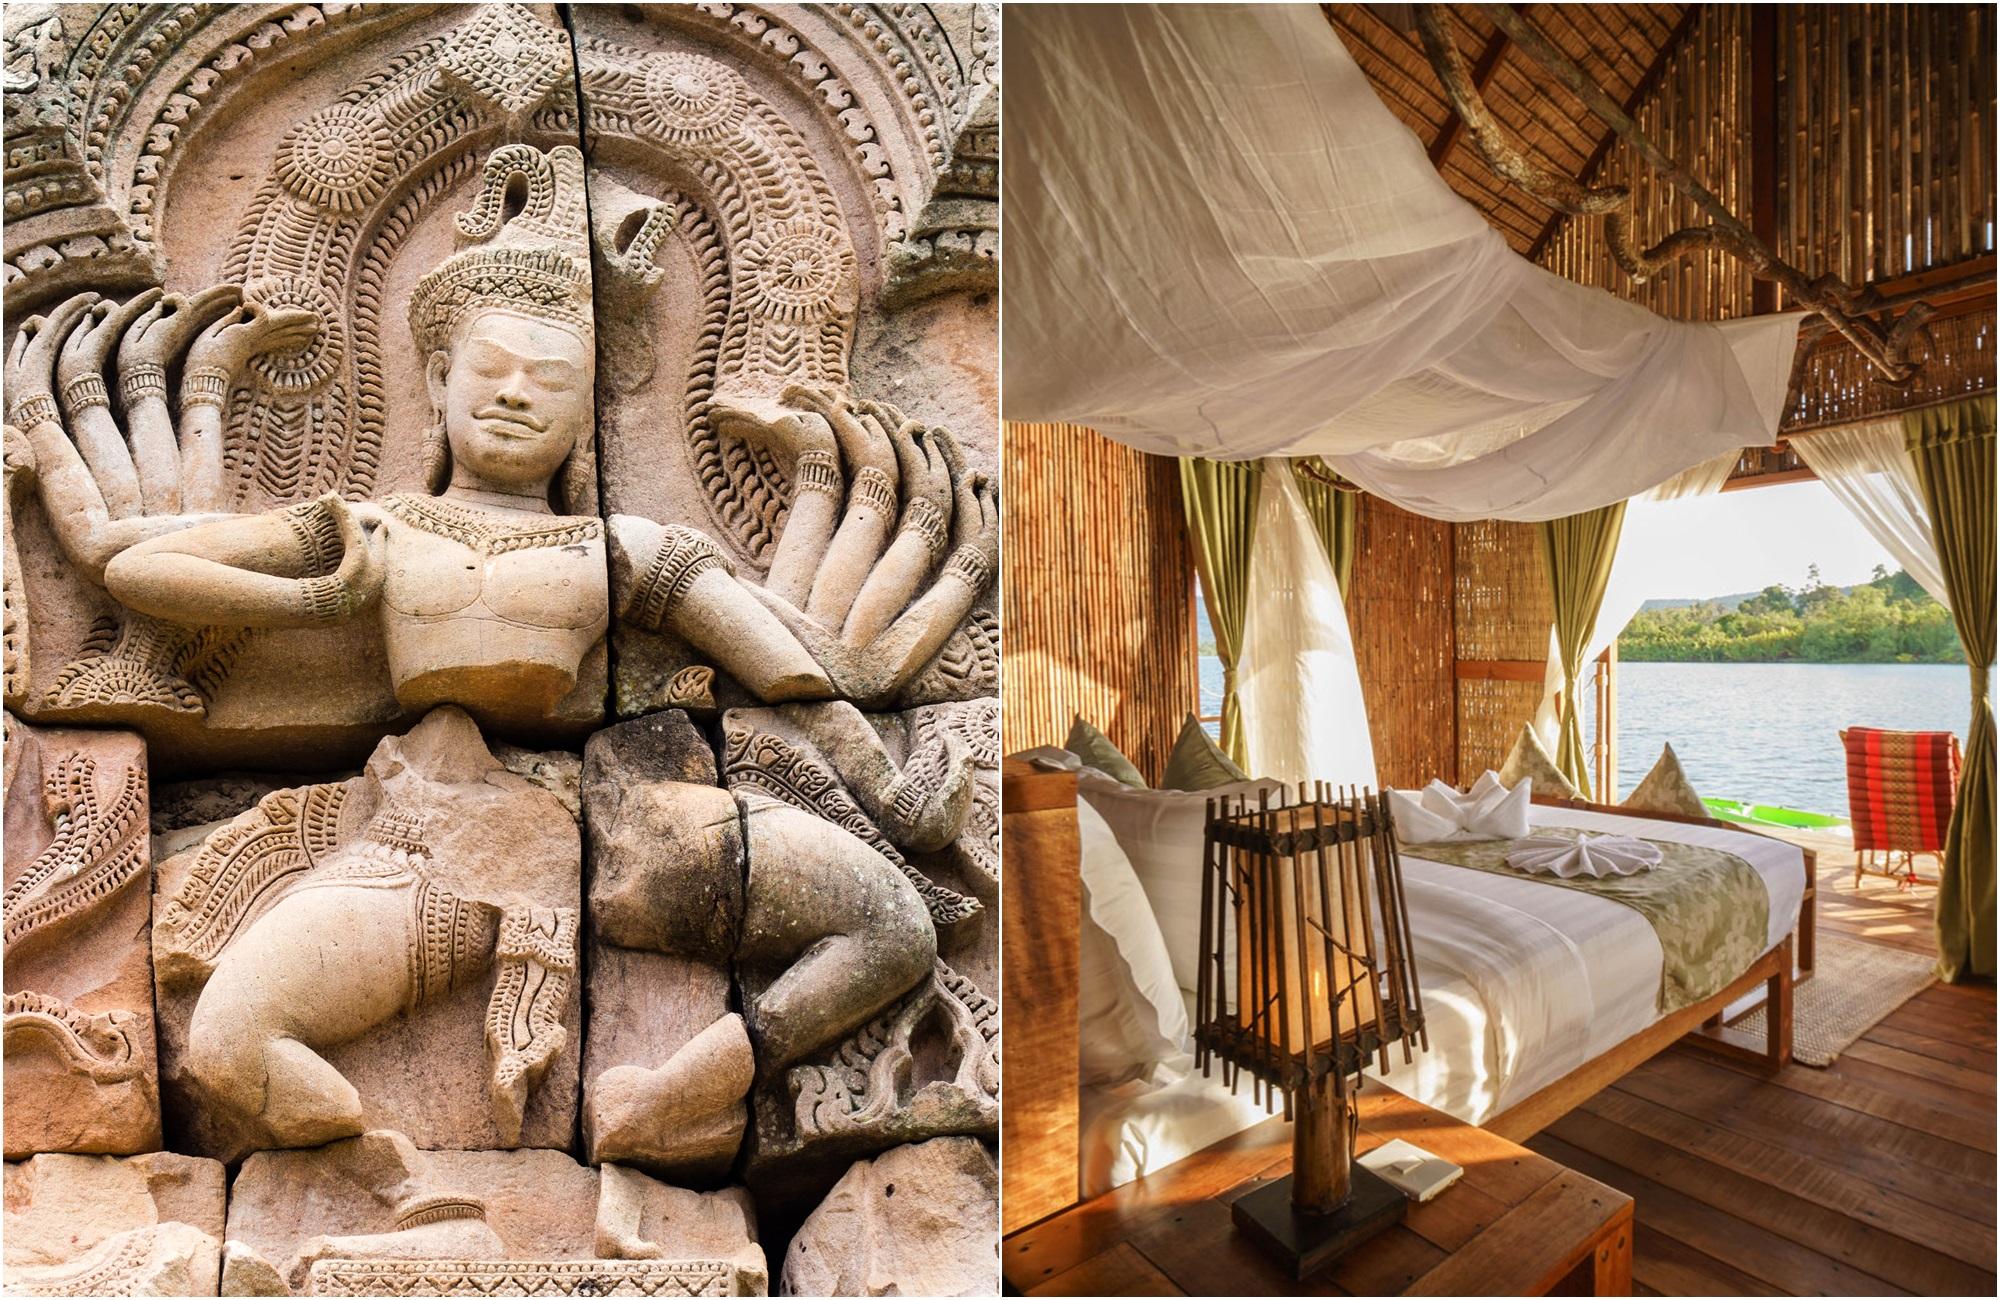 Voyage Thailande - Cambodge - Phanom Rung et Koh Andet - Amplitudes